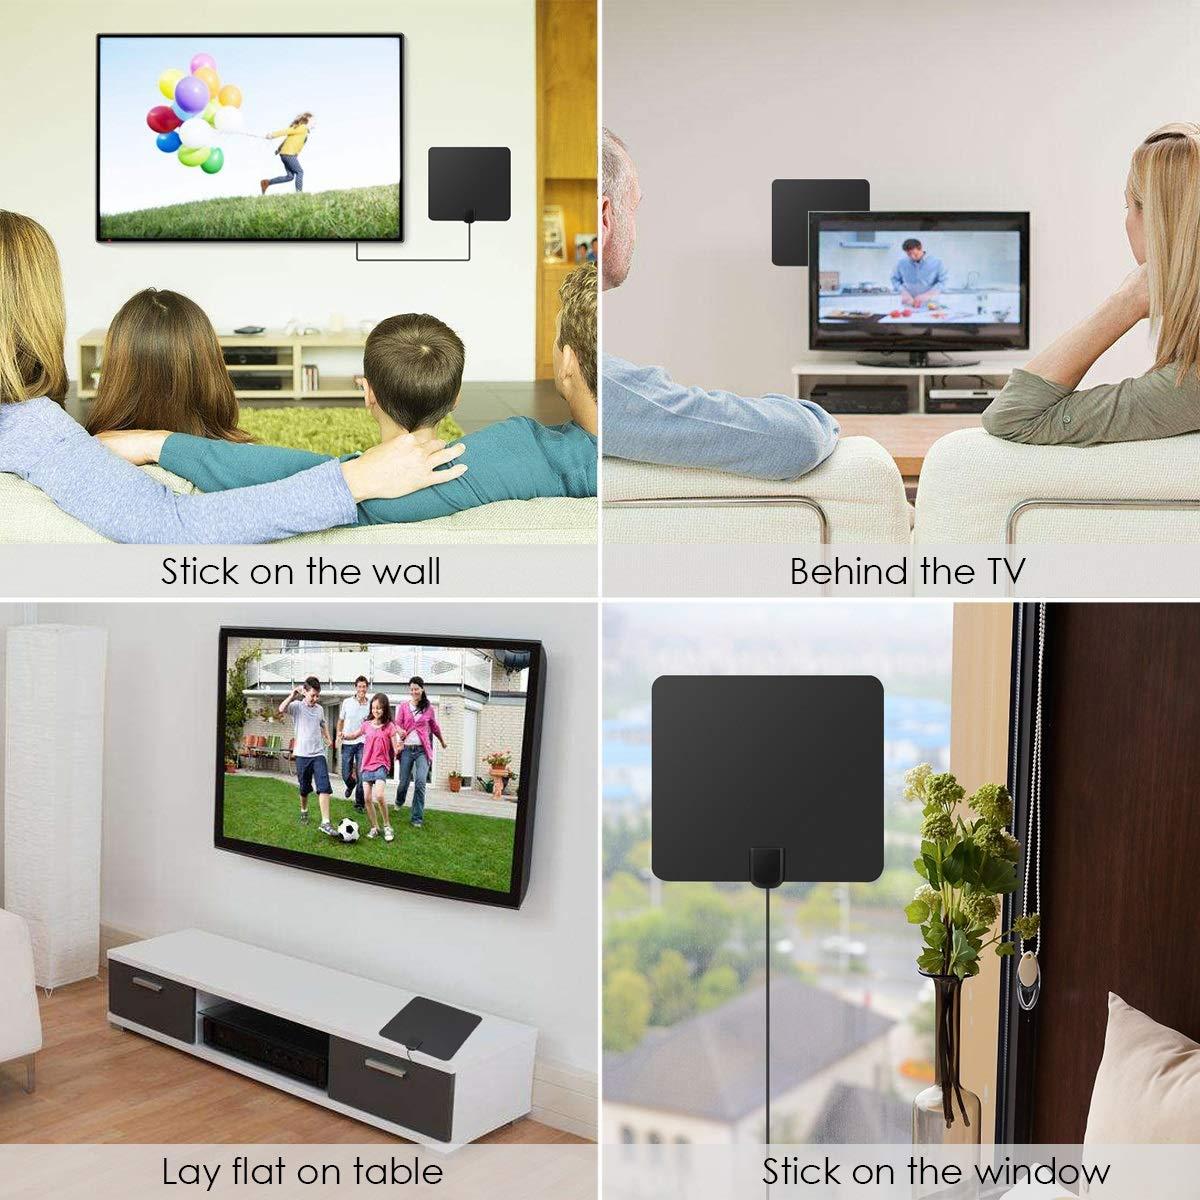 Jinxuny Antena Interior de TV HDTV Digital HDTV con Amplificador de Antena TV Alcance de 50 Millas Delgada